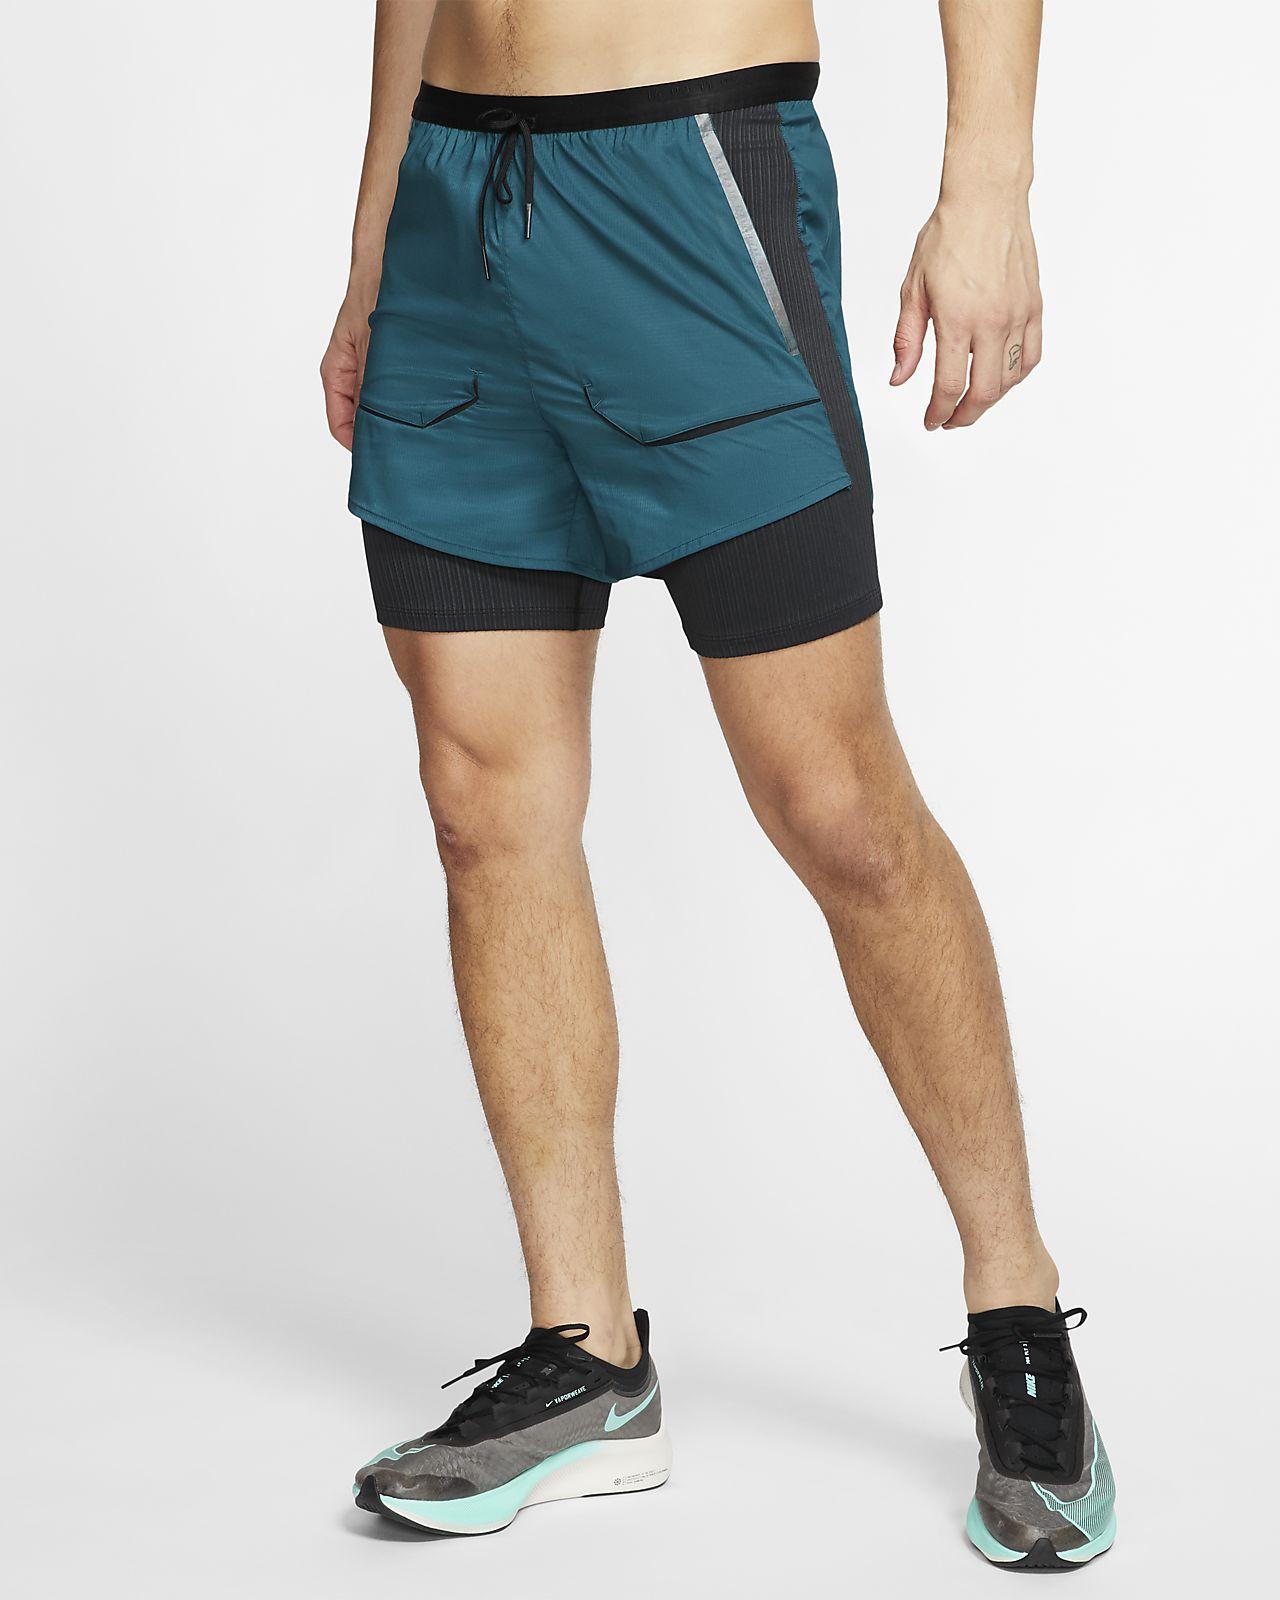 Shorts da running 2 in 1 Nike Tech Pack Uomo